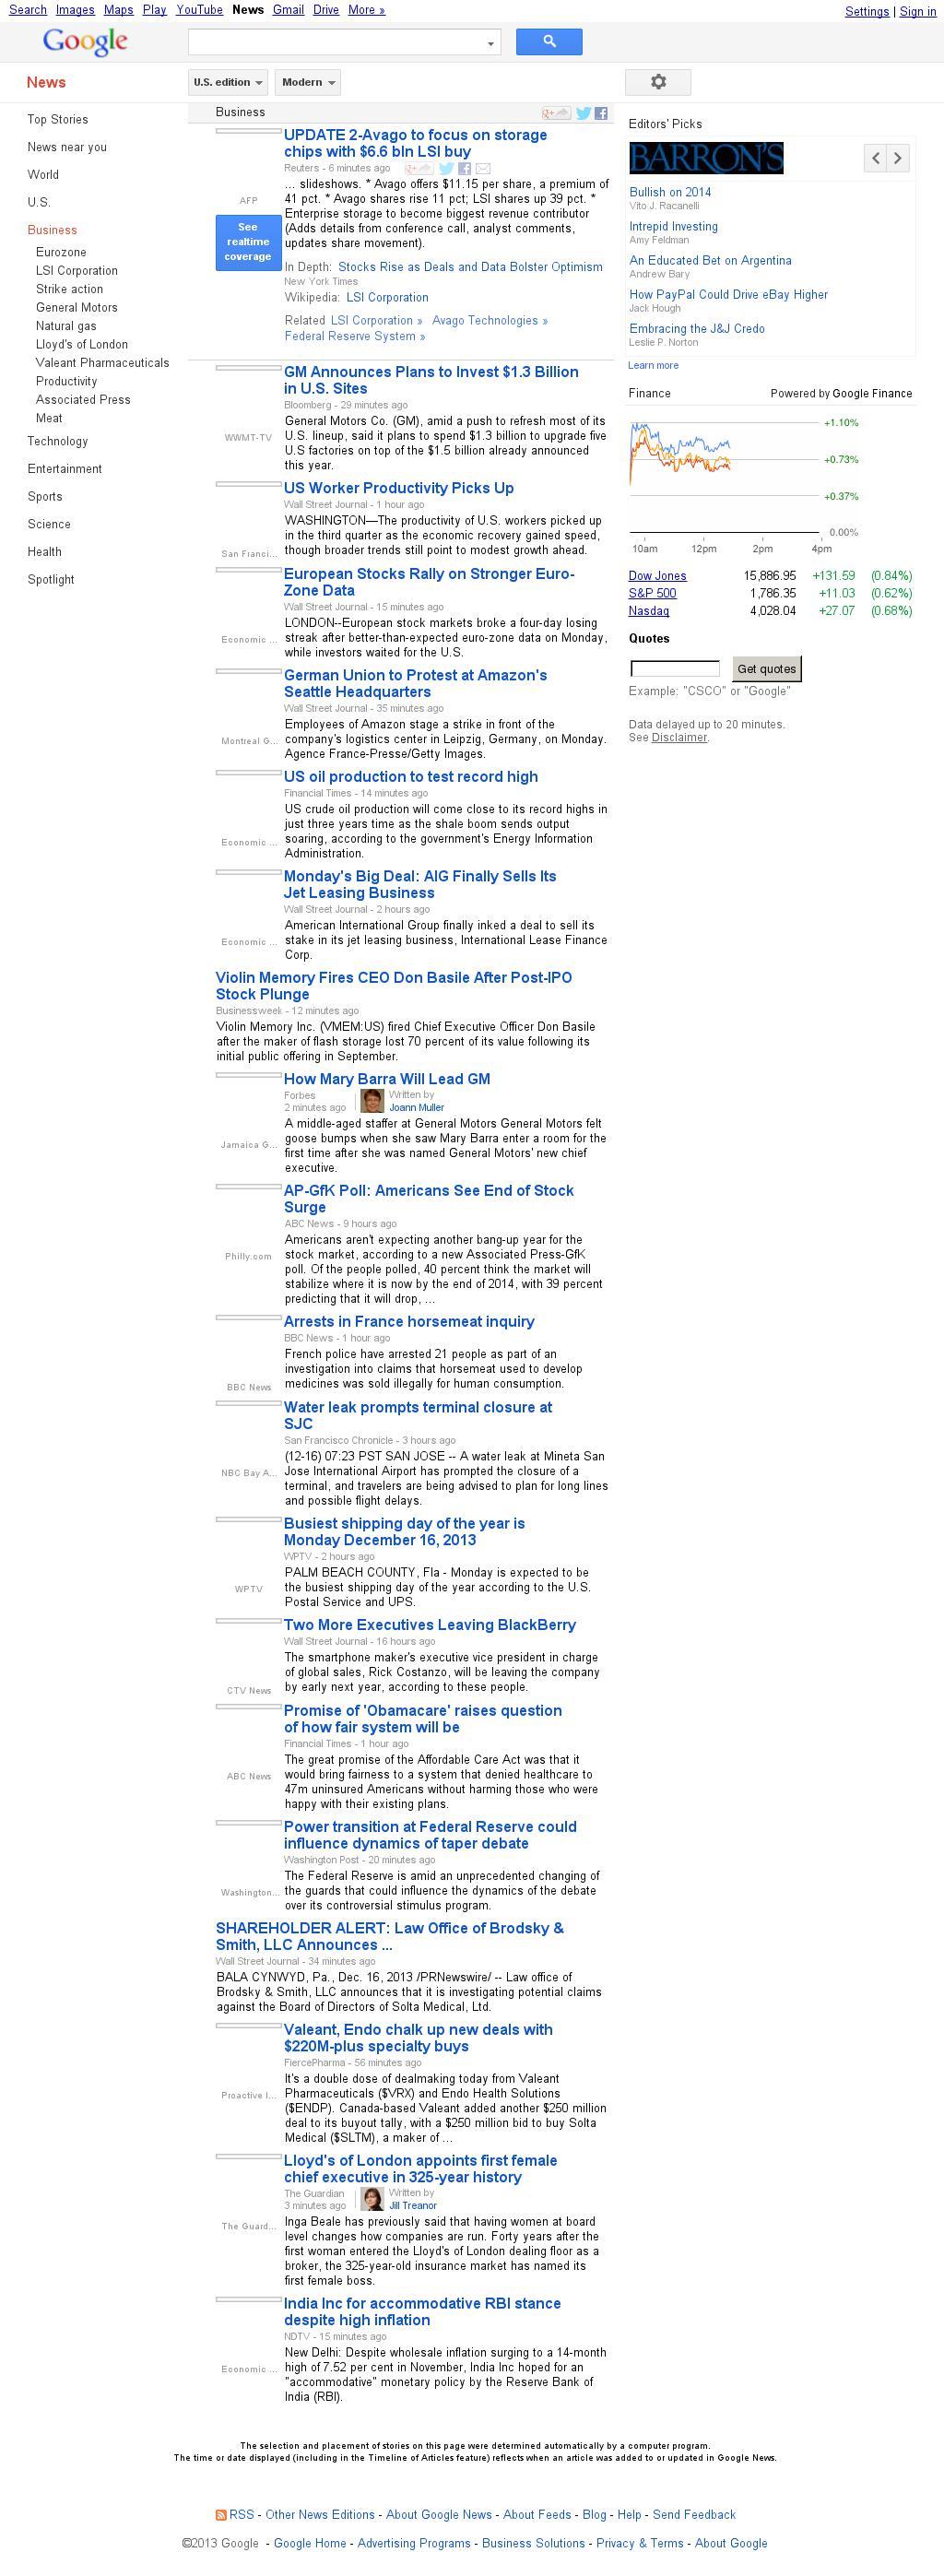 Google News: Business at Monday Dec. 16, 2013, 6:05 p.m. UTC